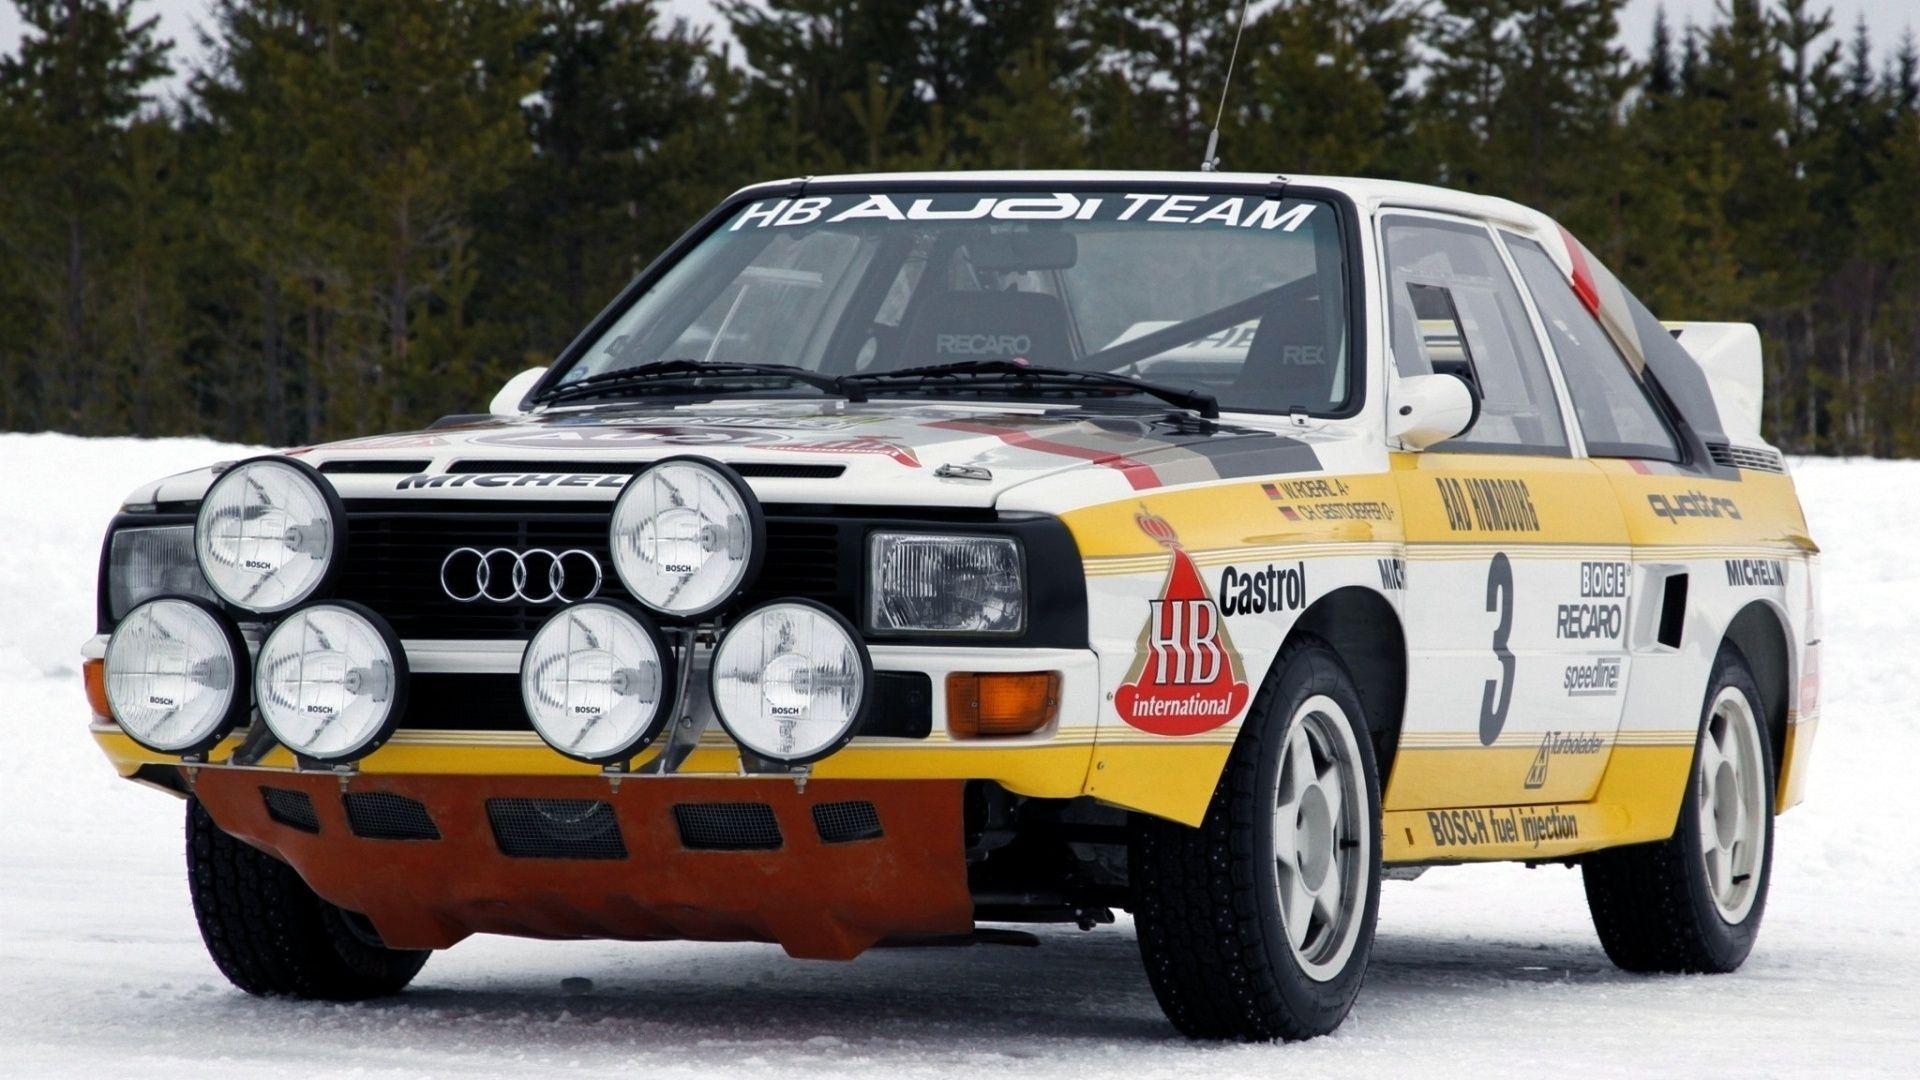 1920x1080 Group B Rally Car Audi Quatro Audi Quattro Rally Audi Sport Audi Volkswagen Auto Group